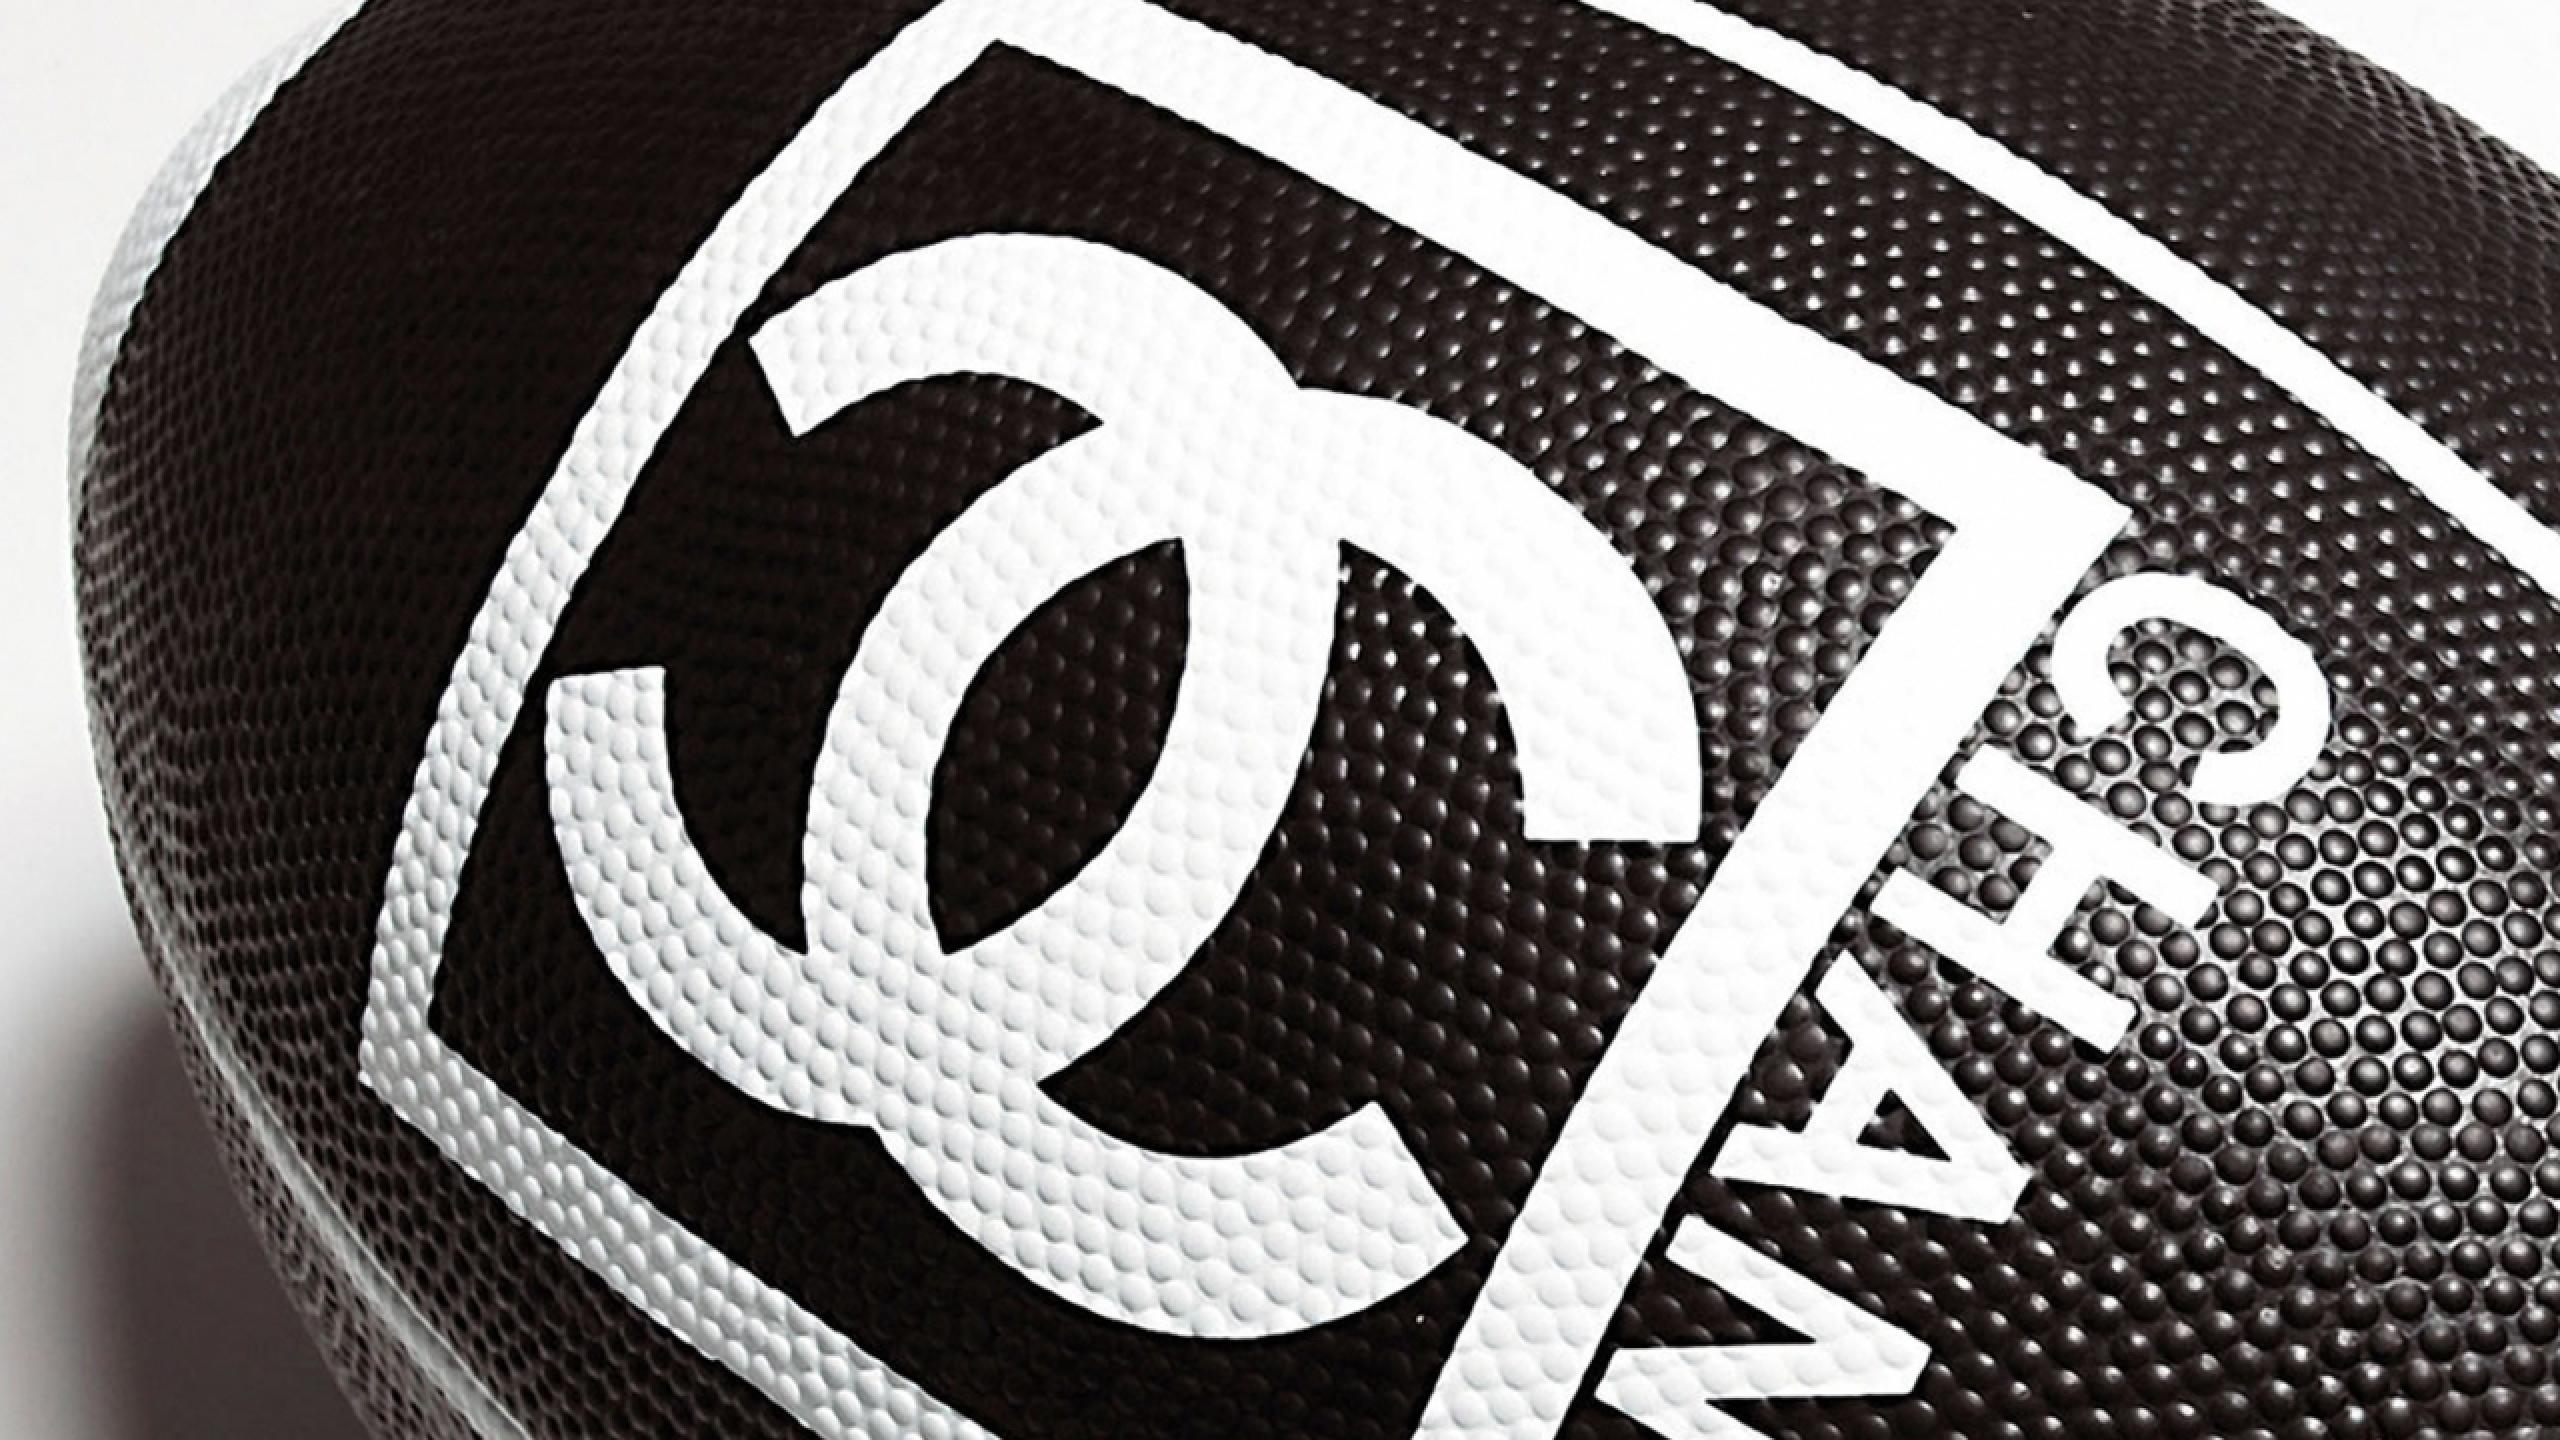 Peace Black Wallpaper Chanel Wallpapers Backgrounds Free Download Pixelstalk Net